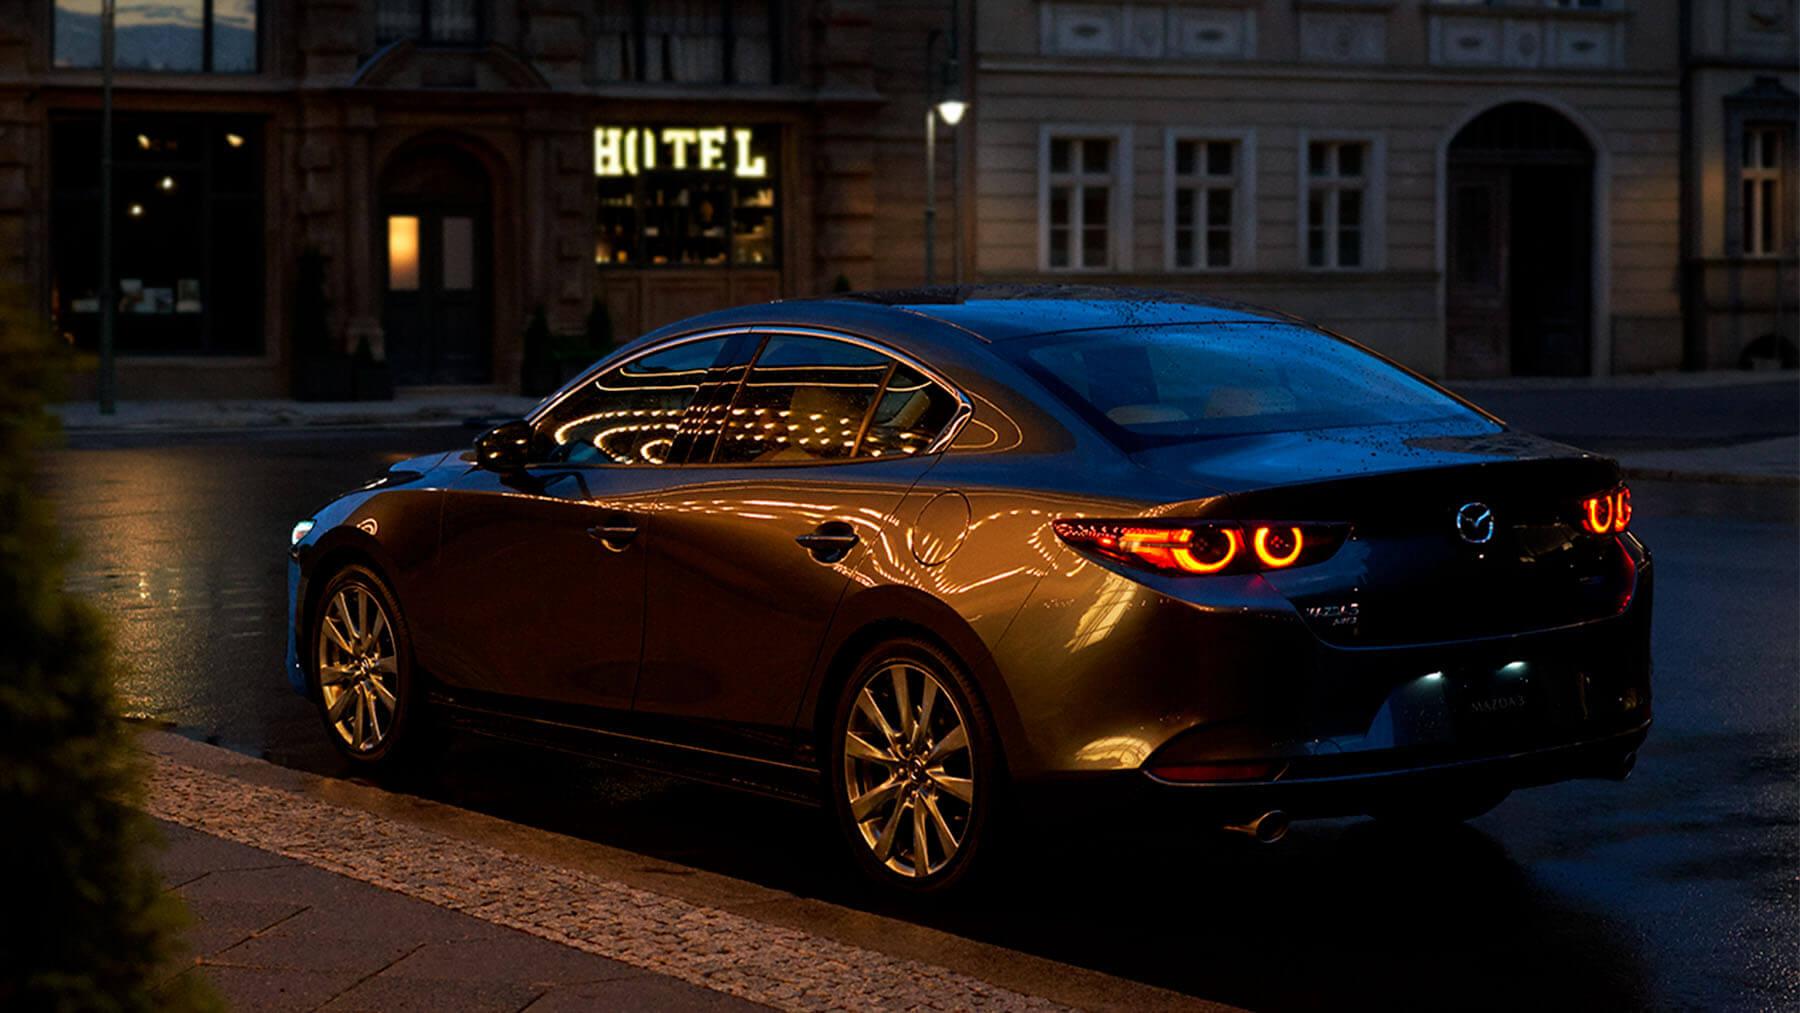 Galeria - All-New Mazda3 Sedán